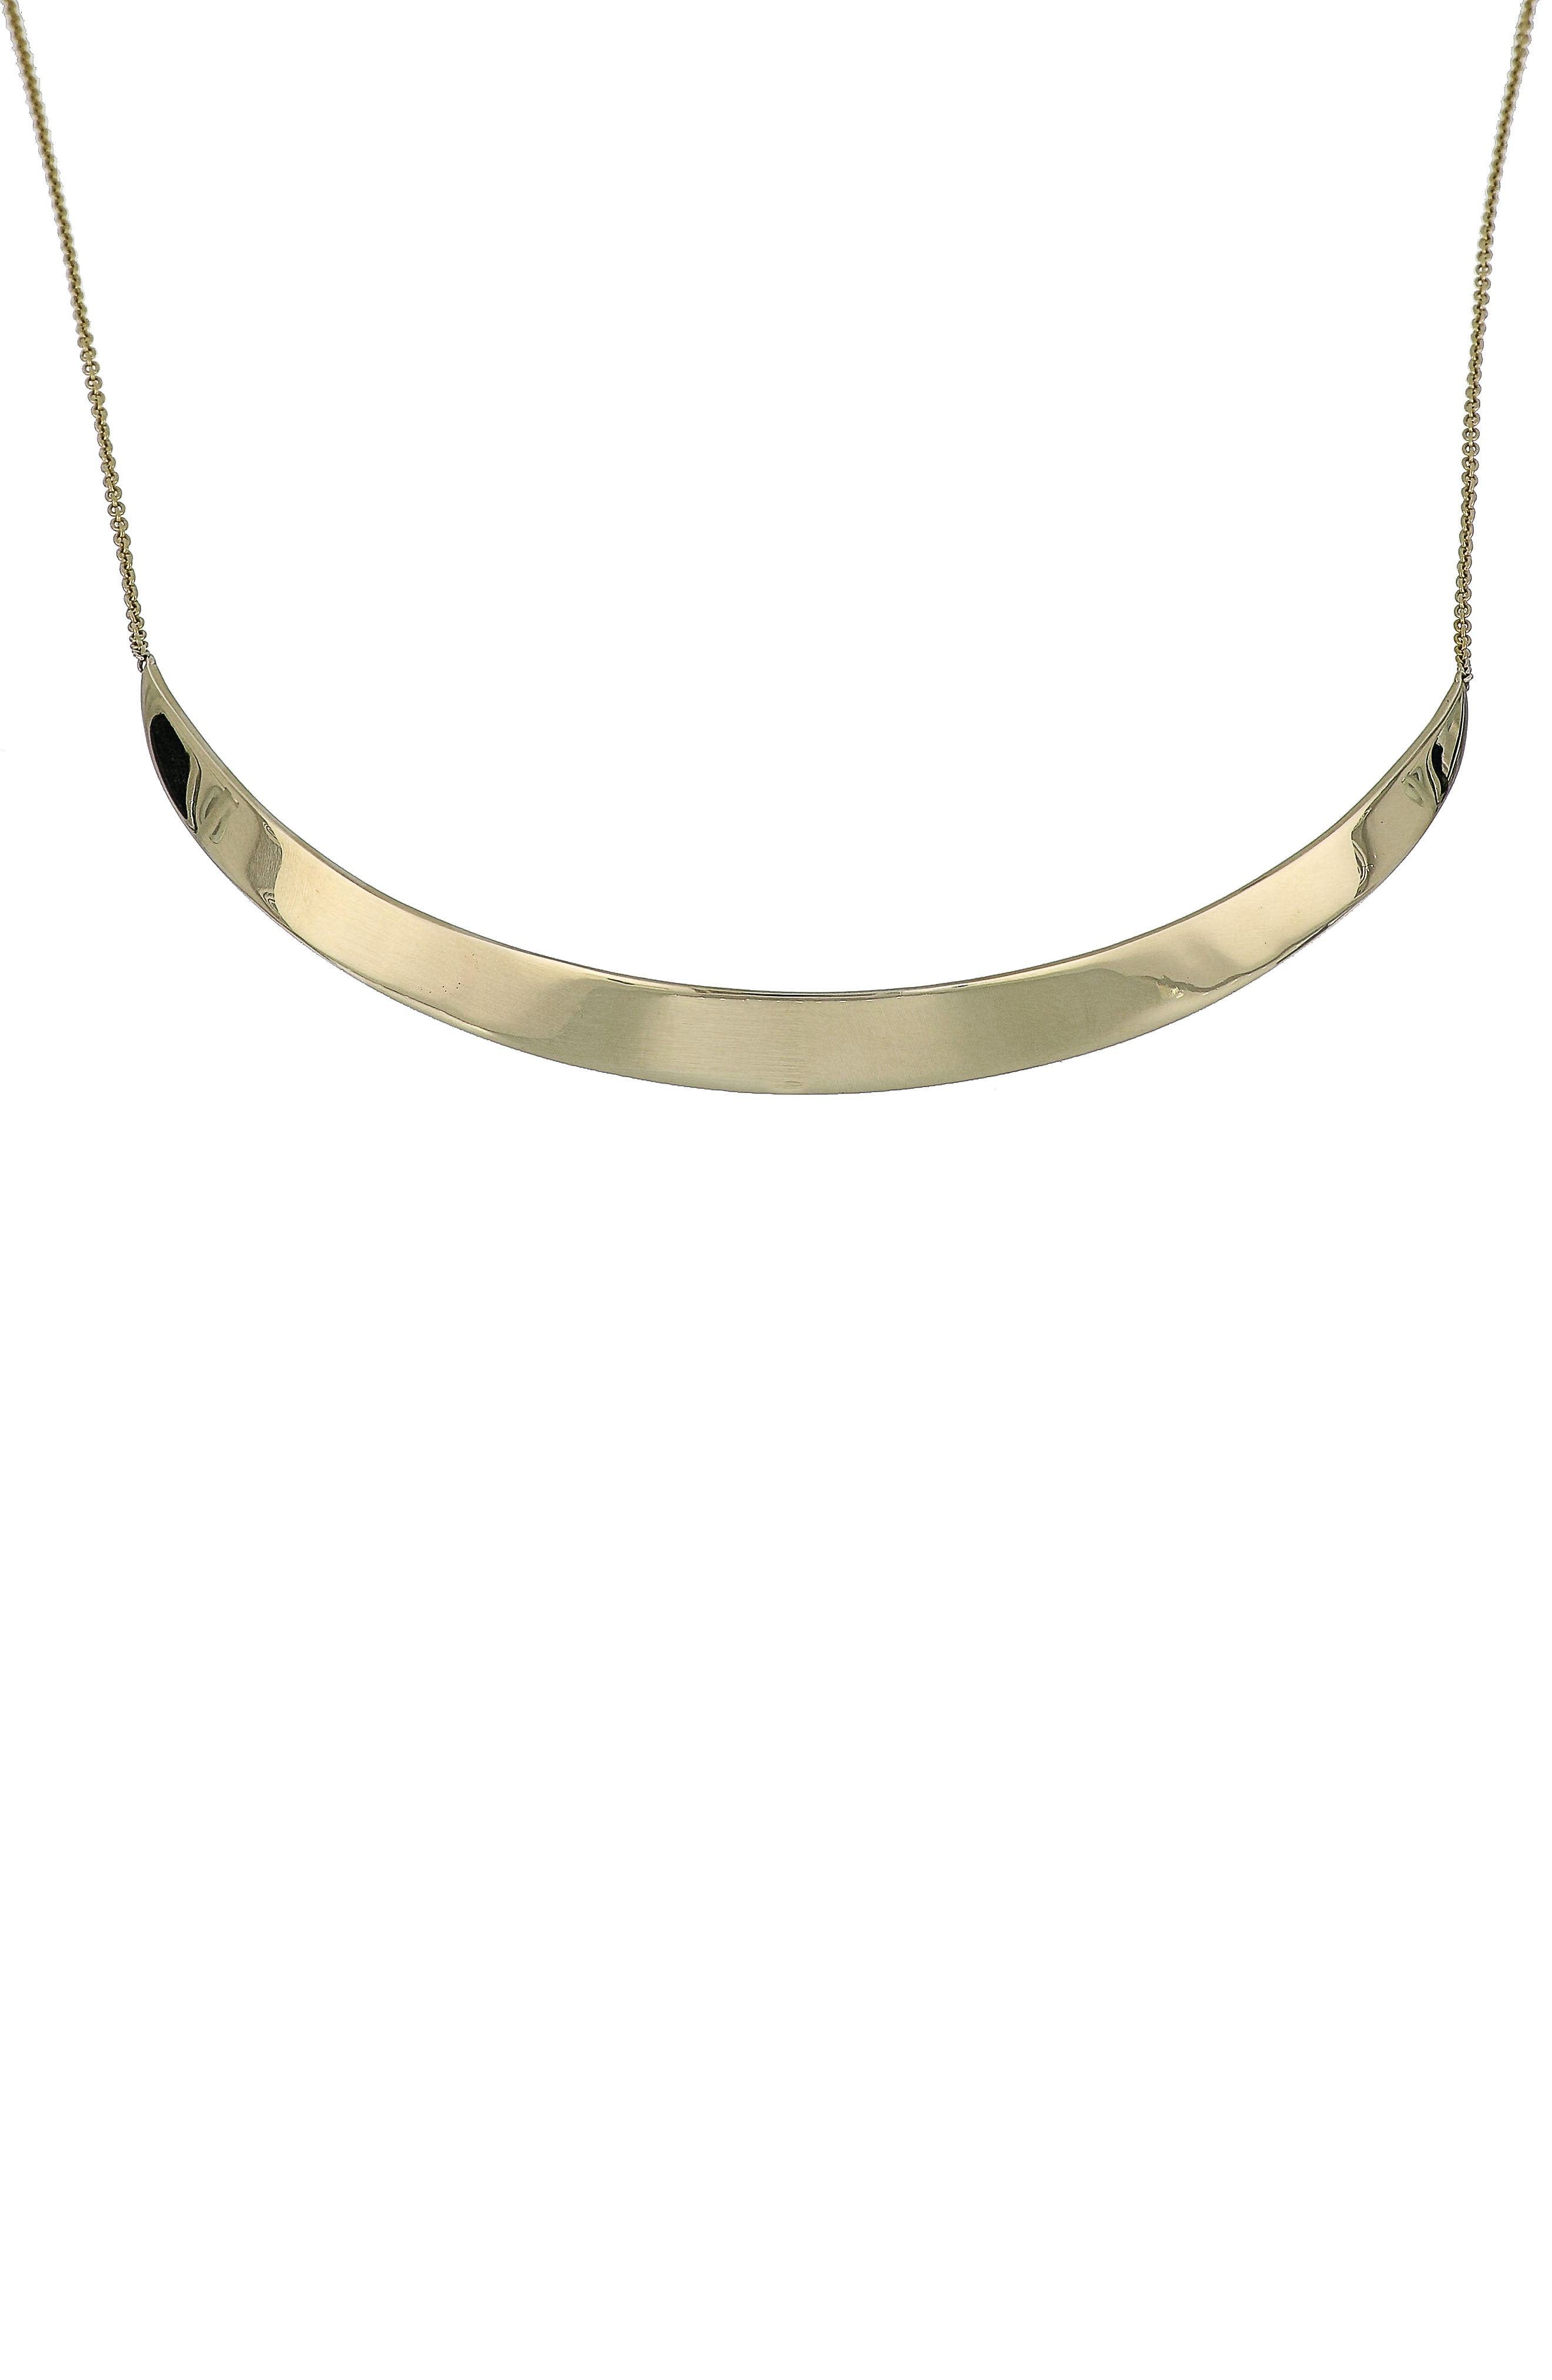 Bar Necklace,                             Main thumbnail 1, color,                             Yellow Gold